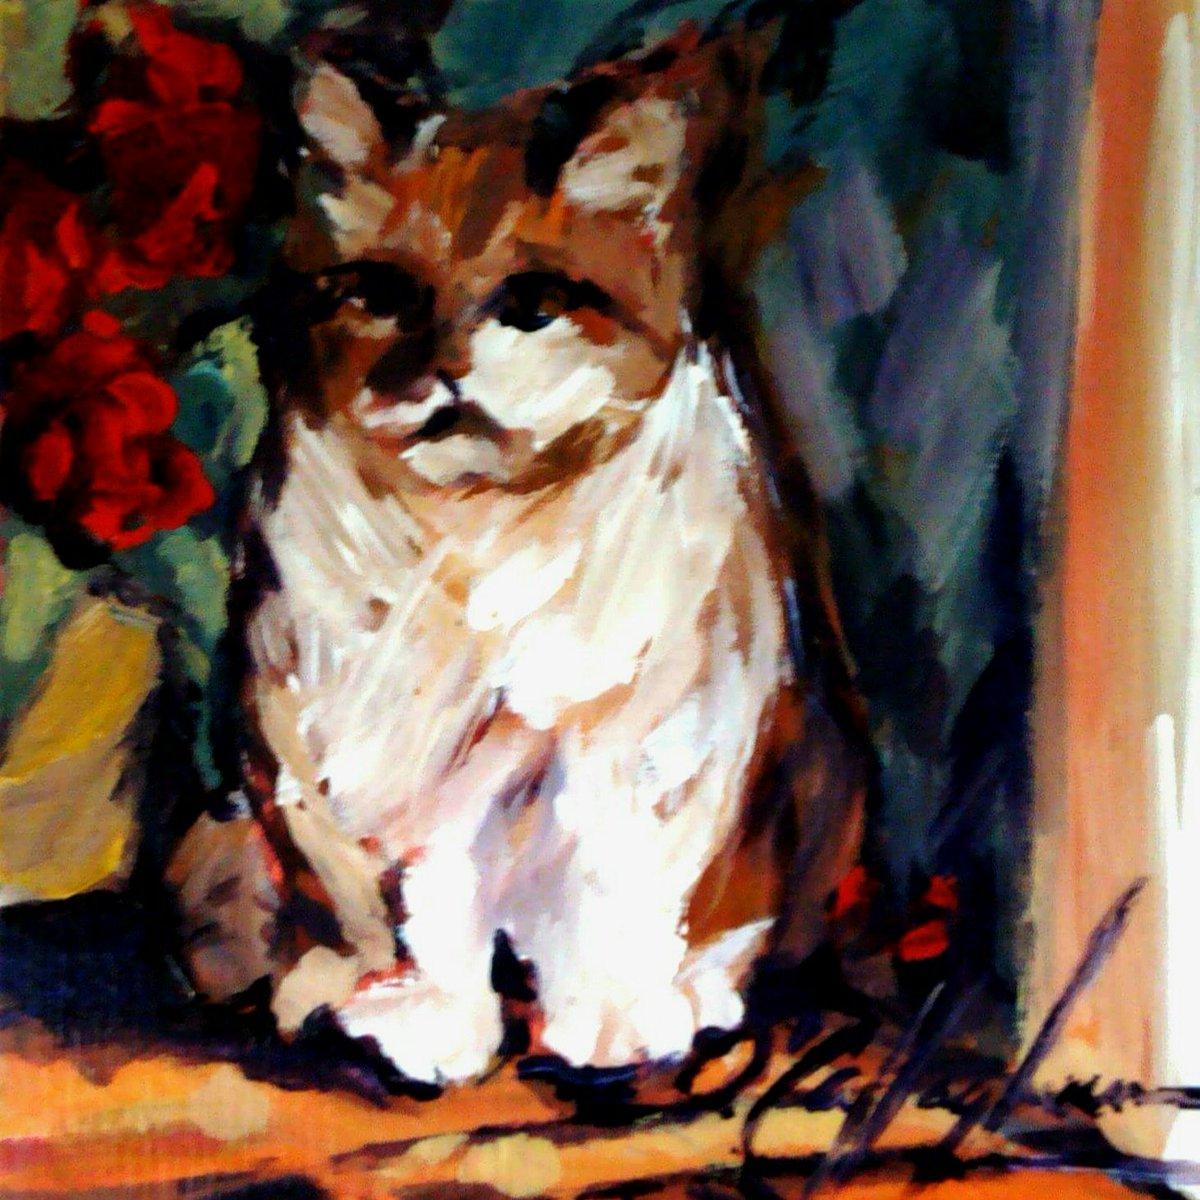 #portrait  of #buddythecat in a doorway #foreverfriends #artistsandtheircats <br>http://pic.twitter.com/05AIQp0qXW